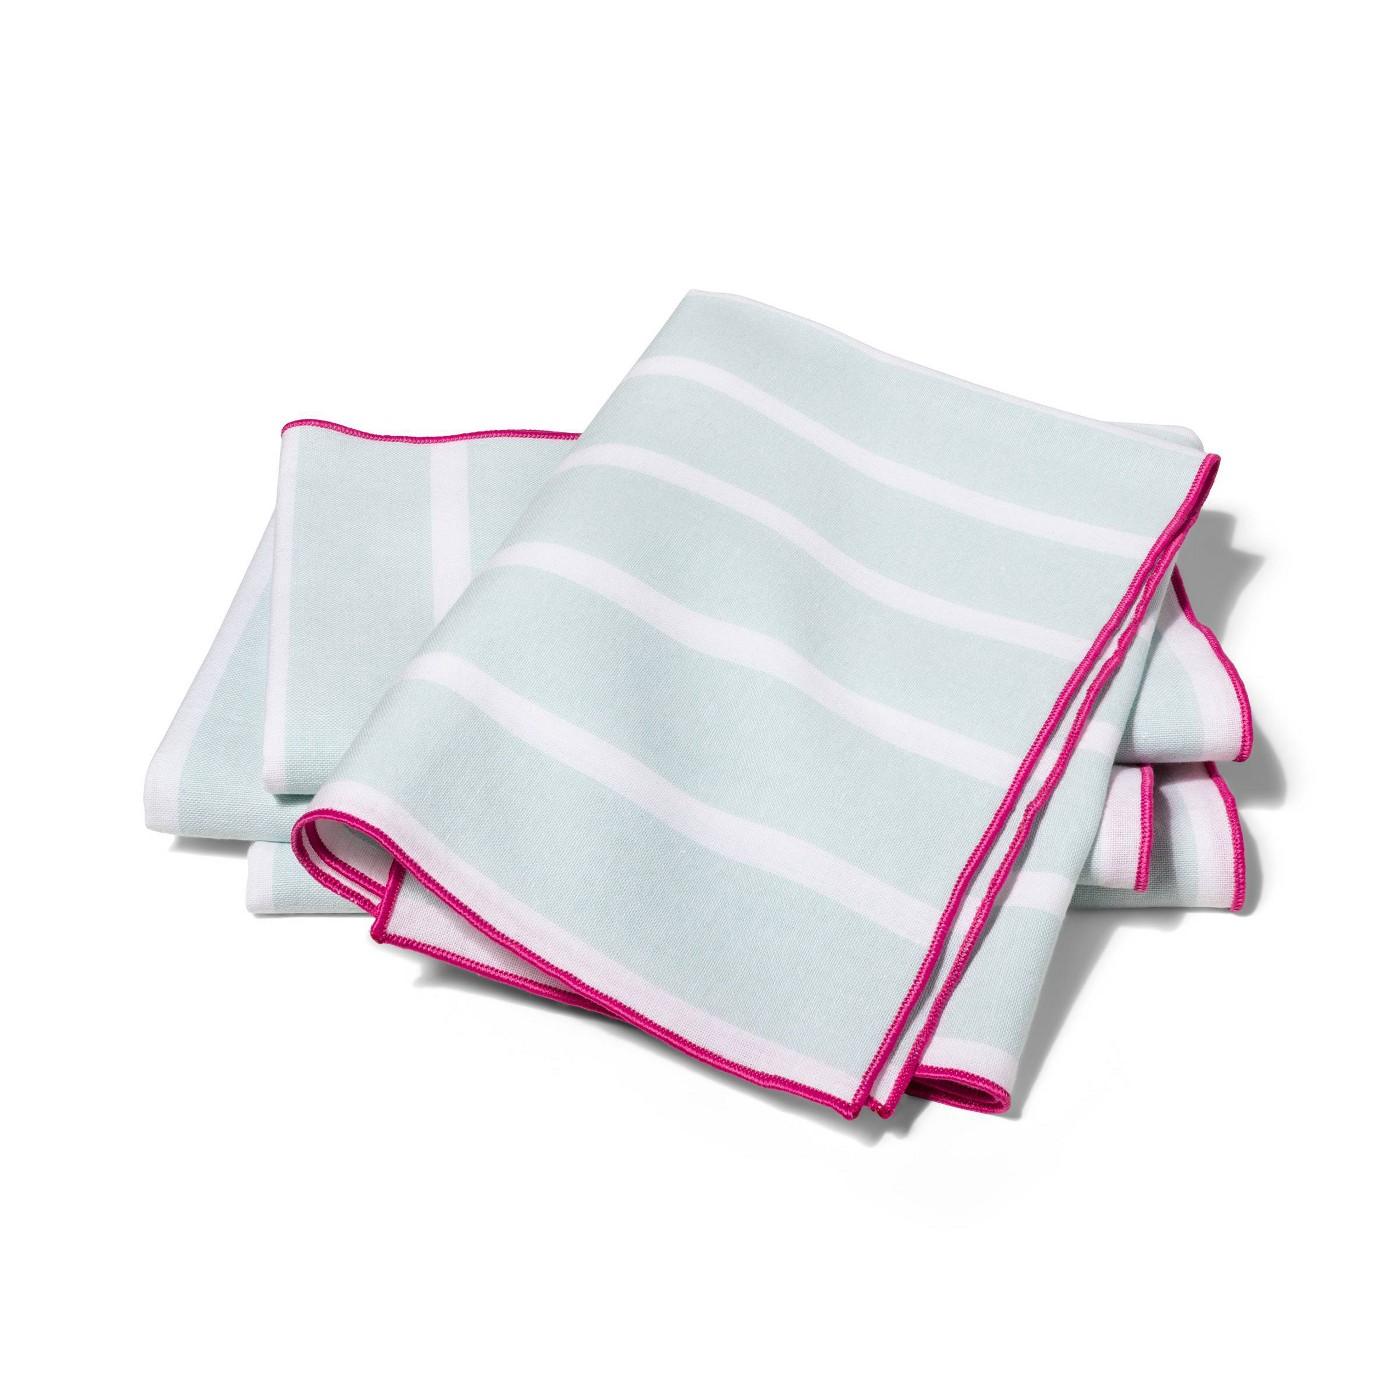 Striped Fabric Napkin Set of 4 - Aqua - vineyard vines® for Target - image 1 of 3